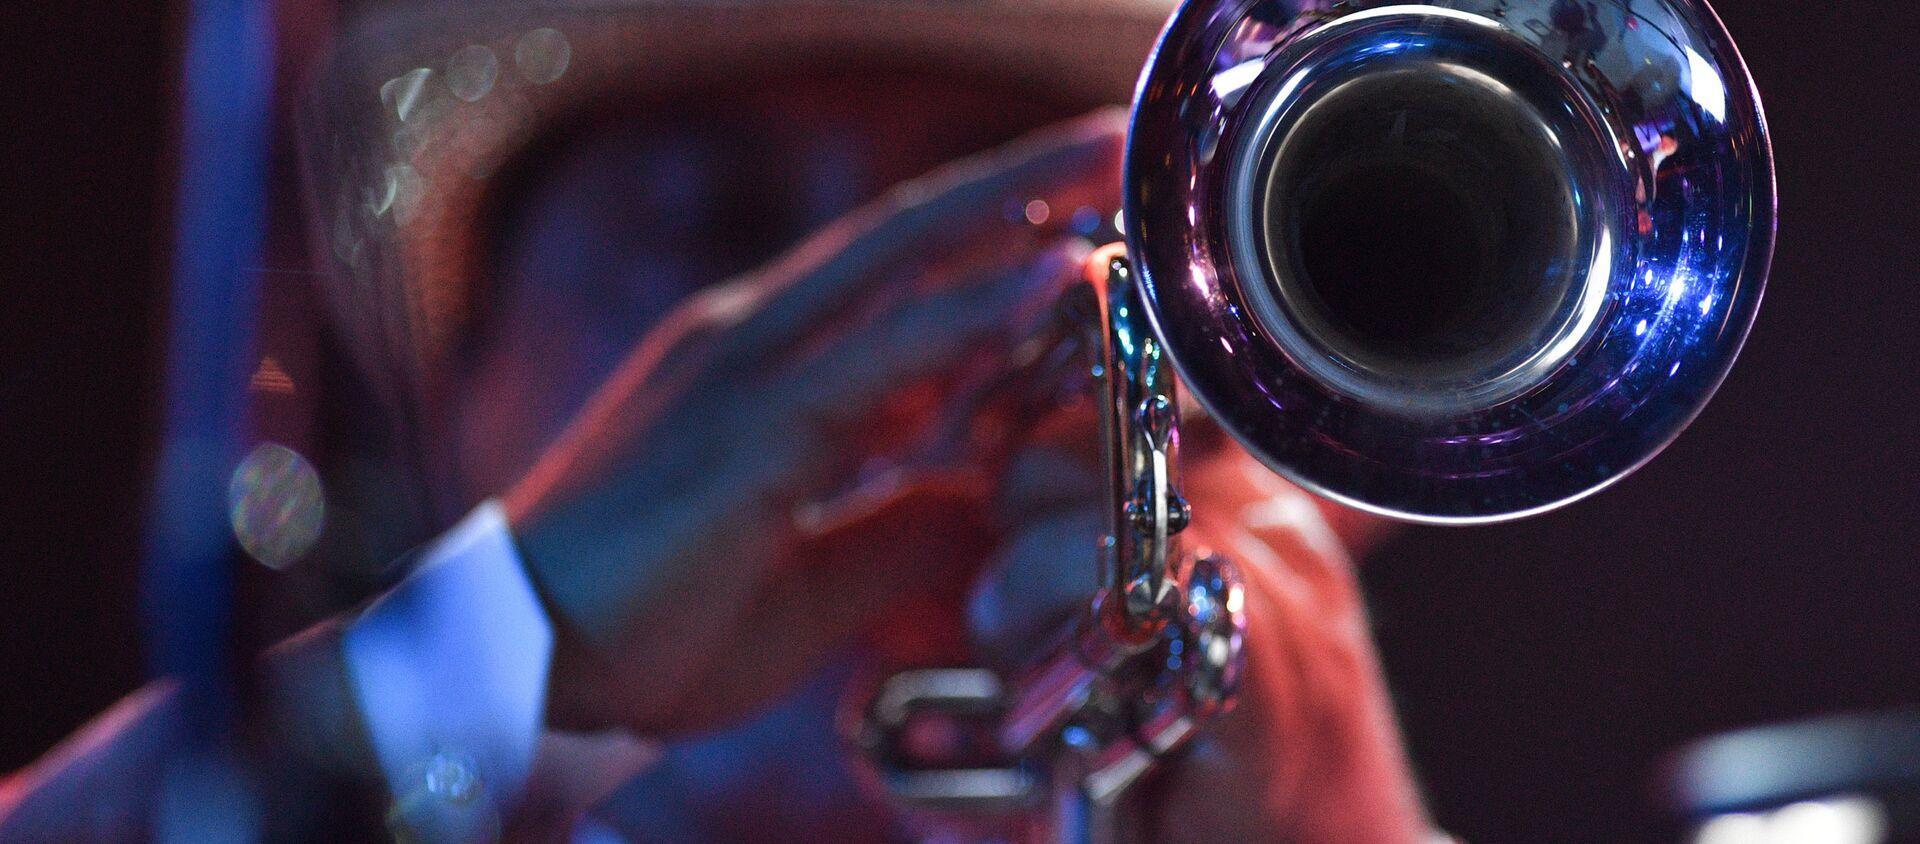 Un músico de jazz - Sputnik Mundo, 1920, 30.04.2019